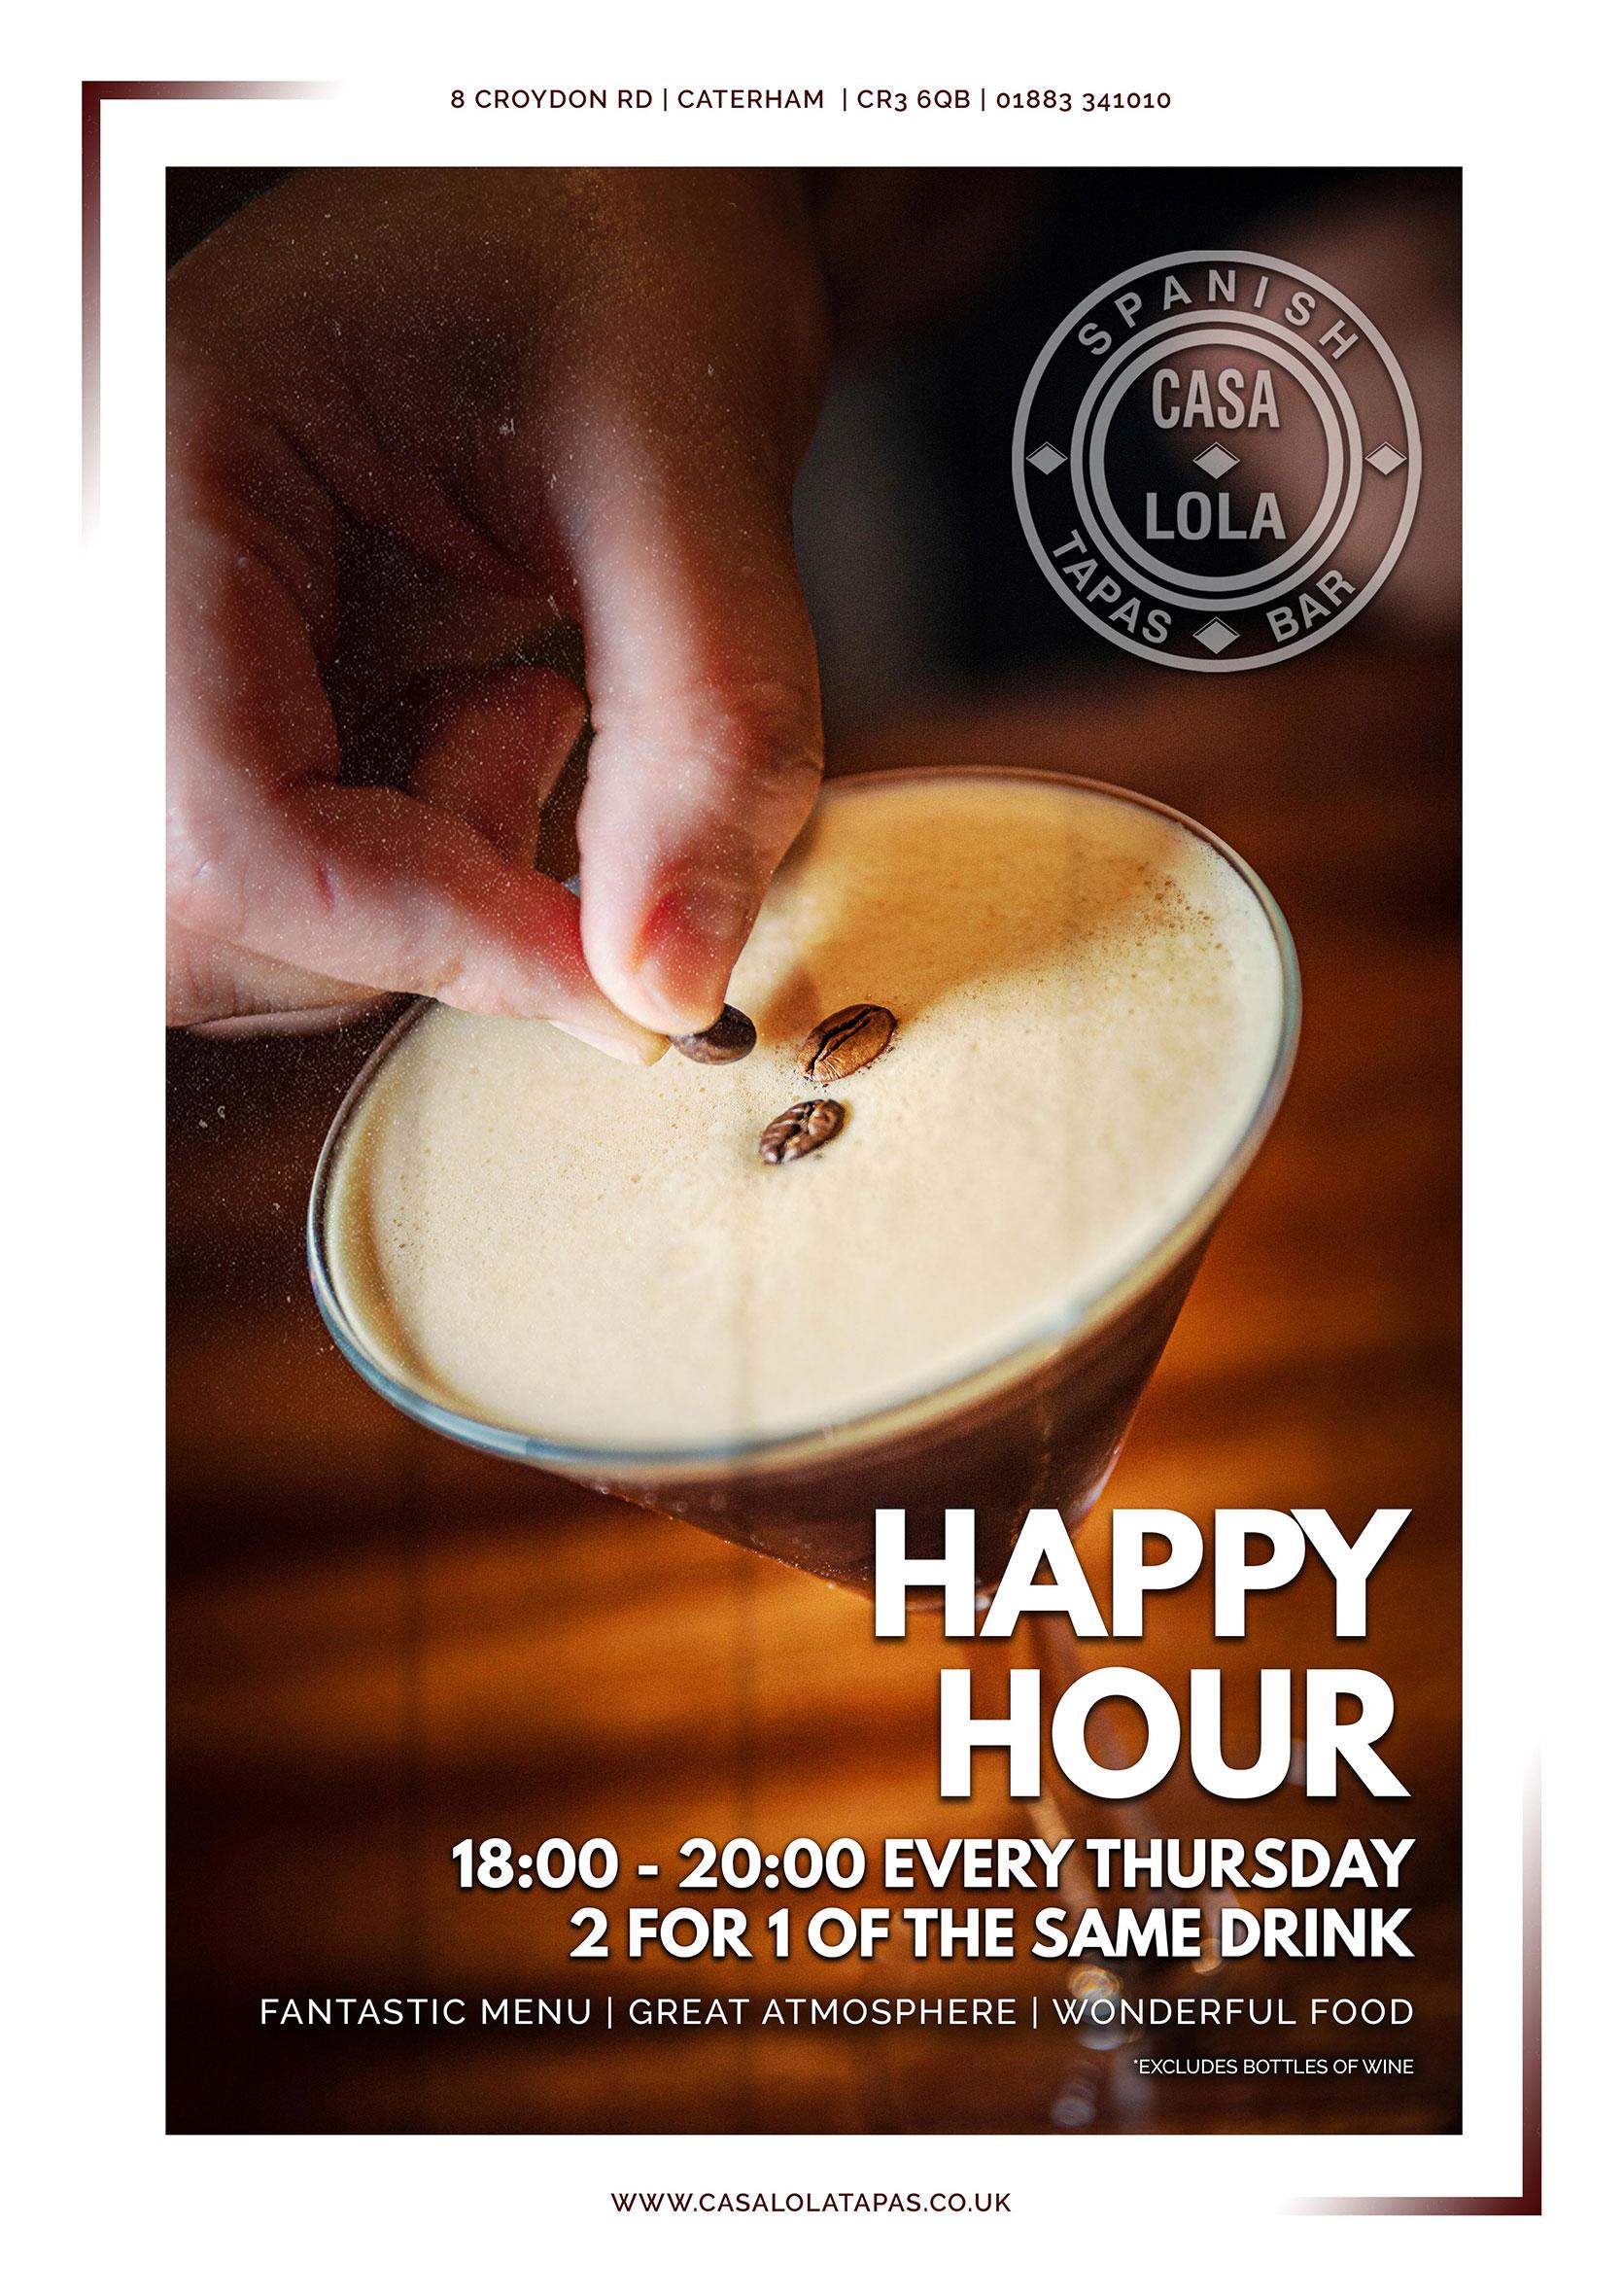 happy-hour_thursday_casa-lola-tapas.jpg